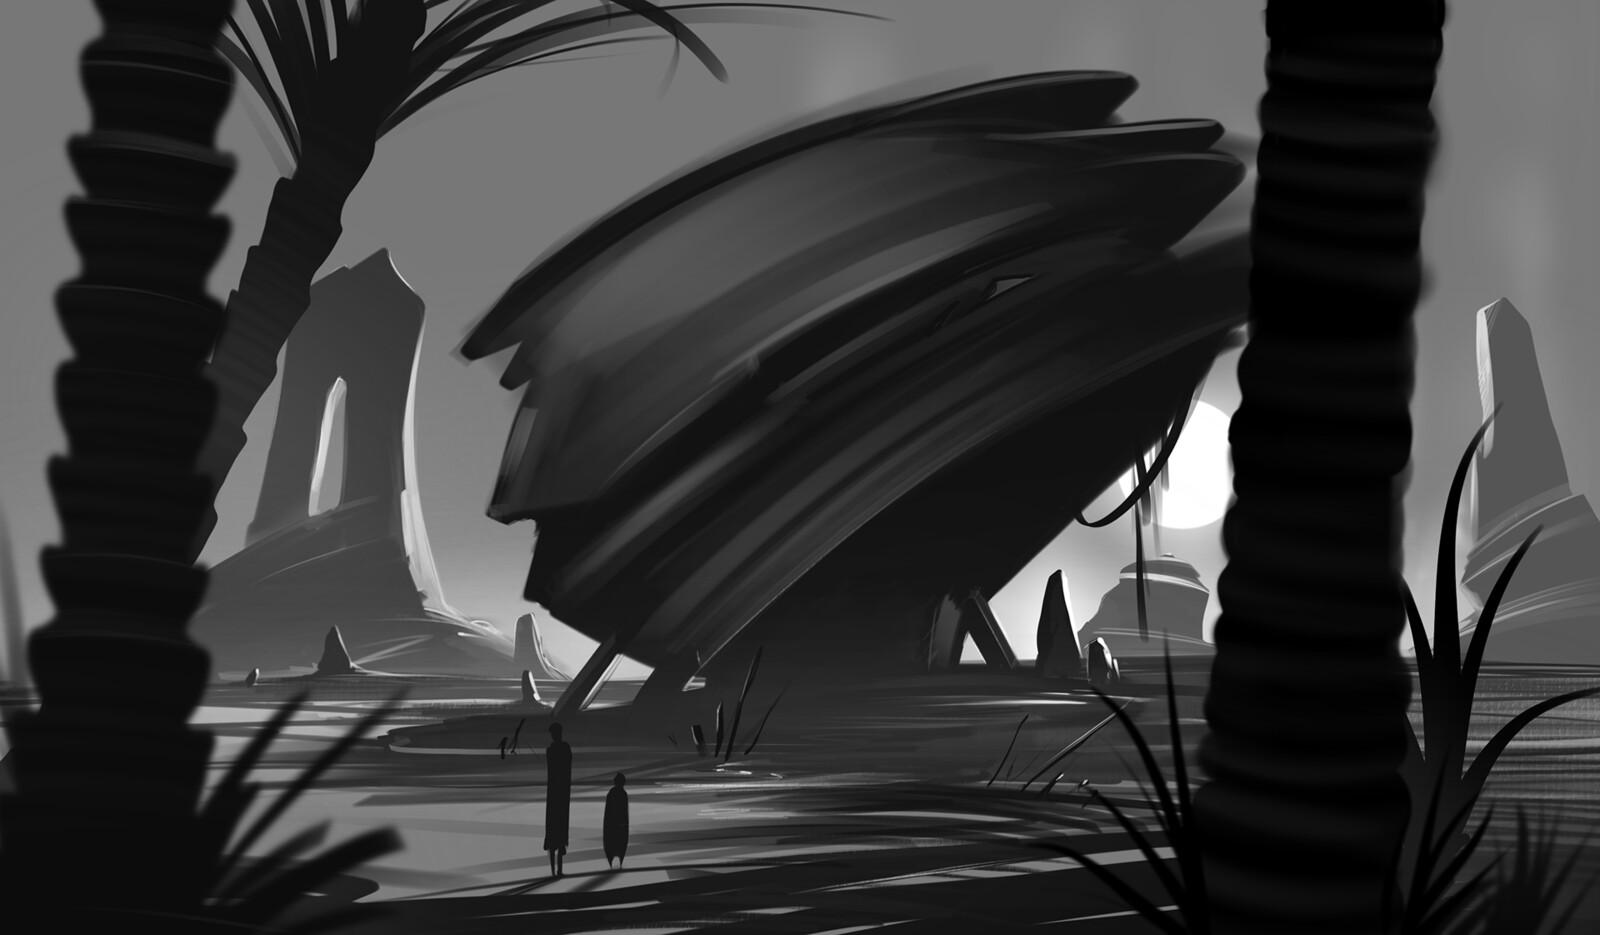 Black&White Quick Sketches